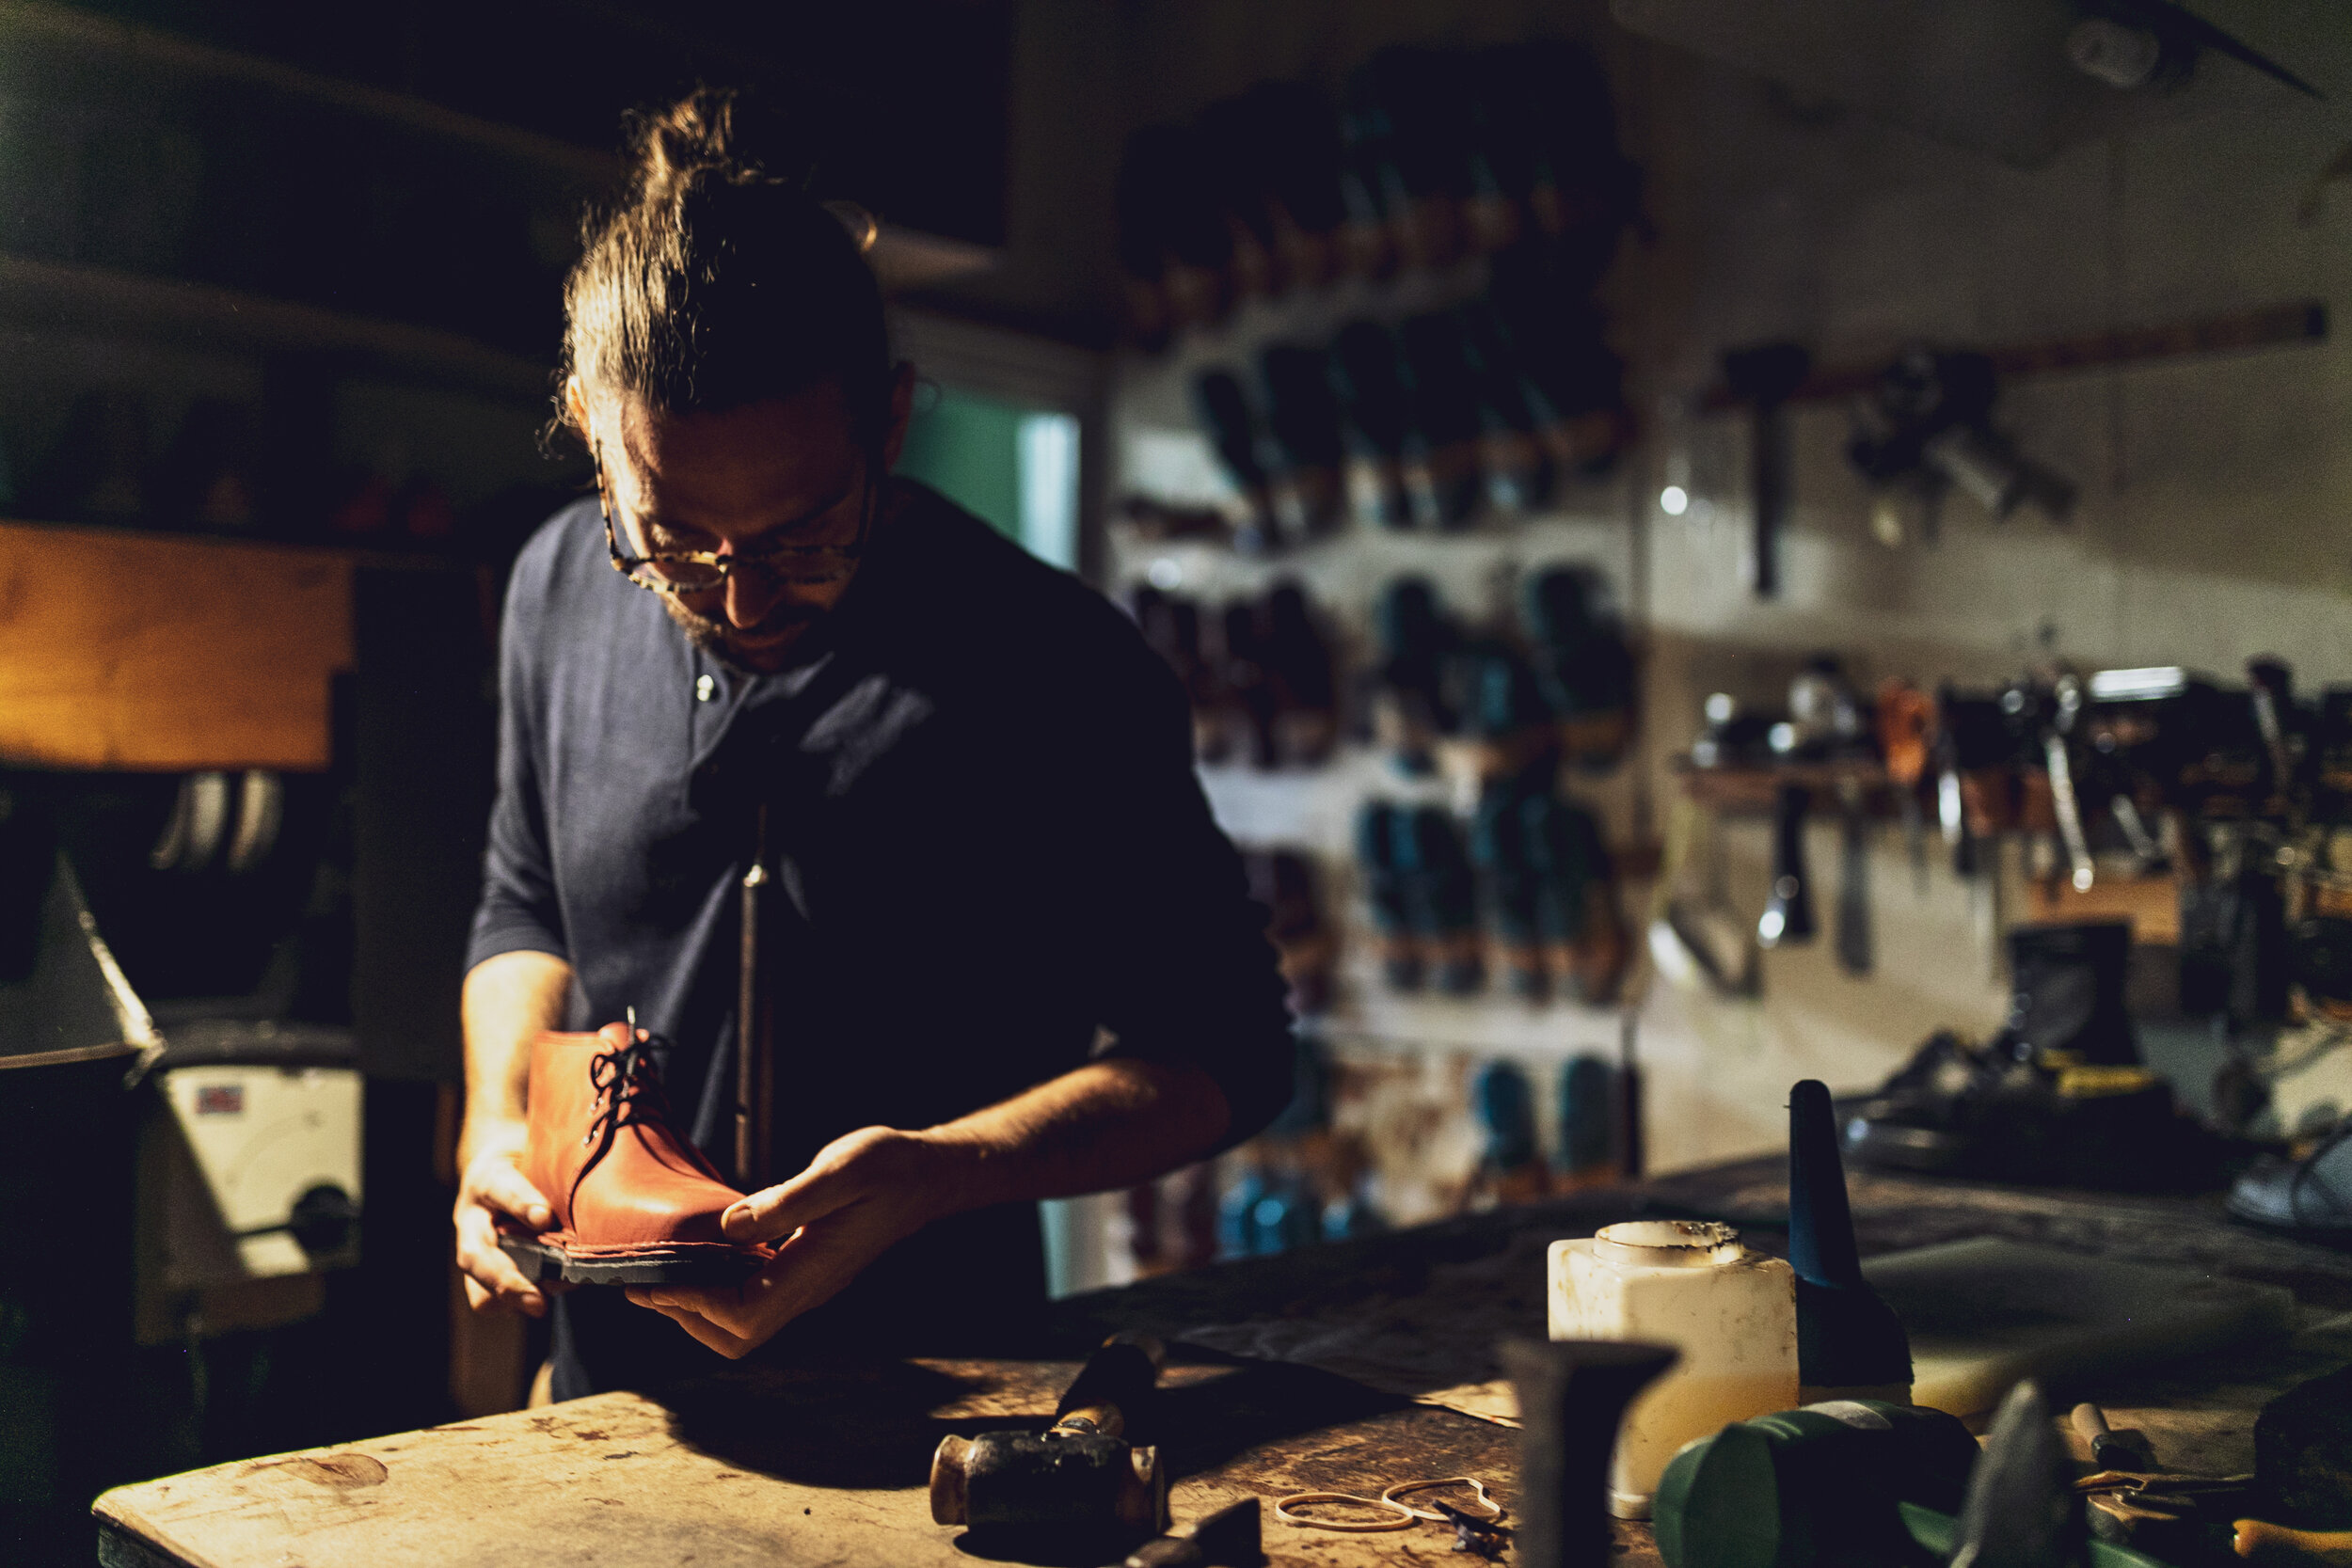 Shoemaker Handmade Shoes England